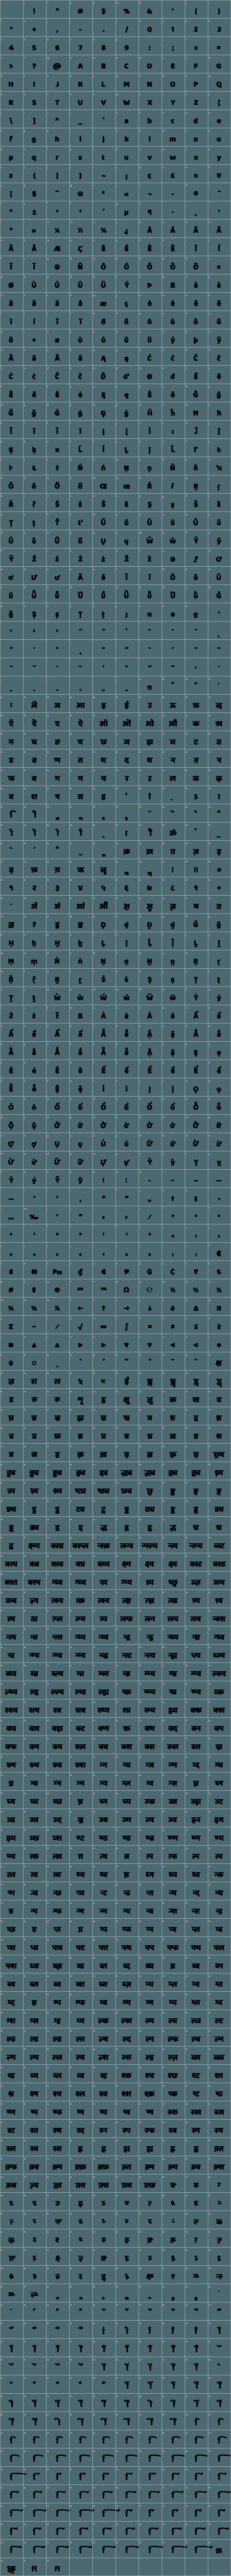 Baloo Font Free by EK Type » Font Squirrel